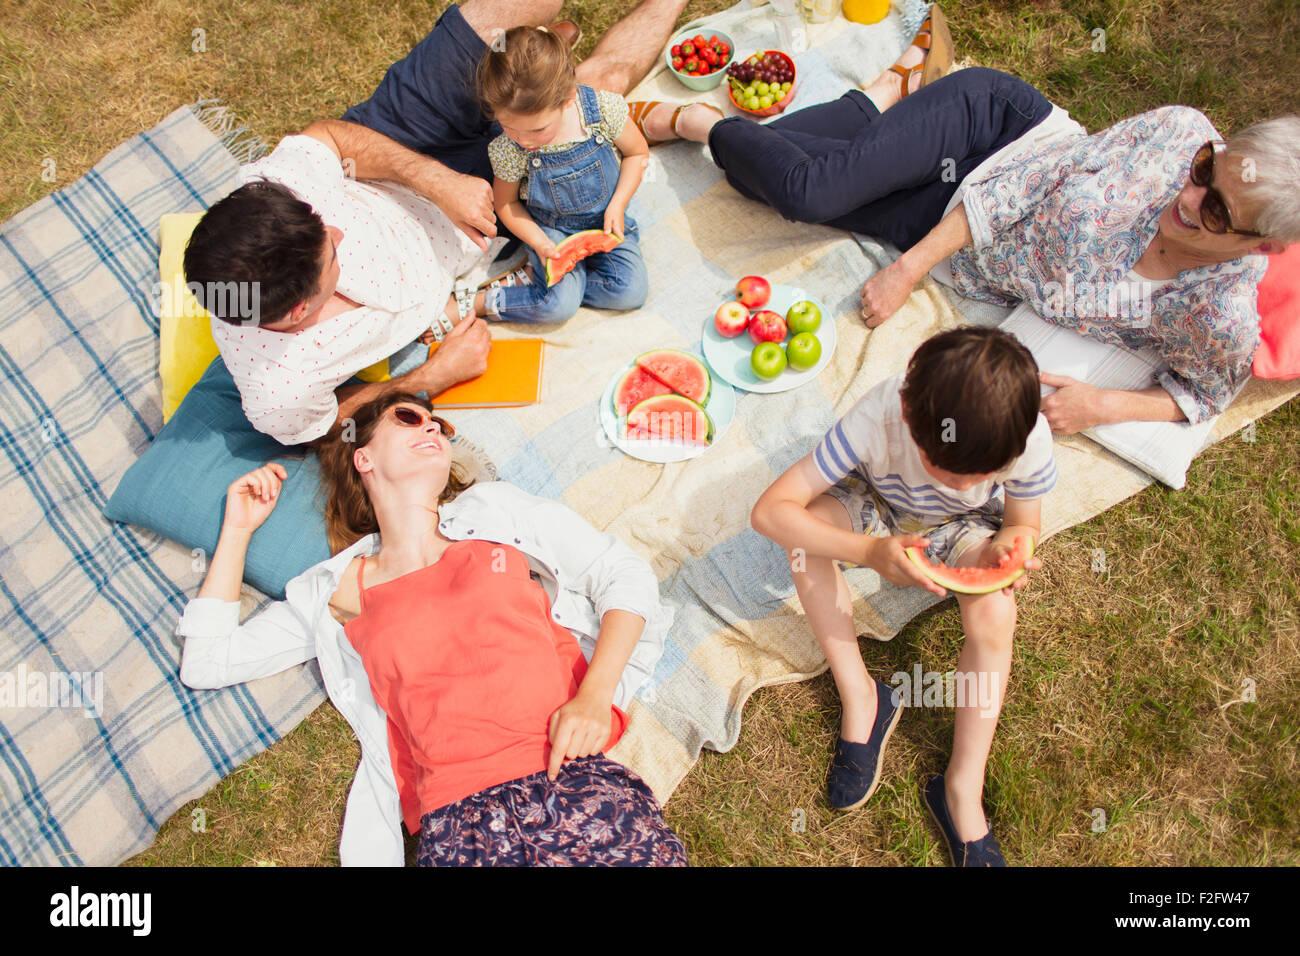 Overhead view multi-generation family enjoying summer picnic - Stock Image